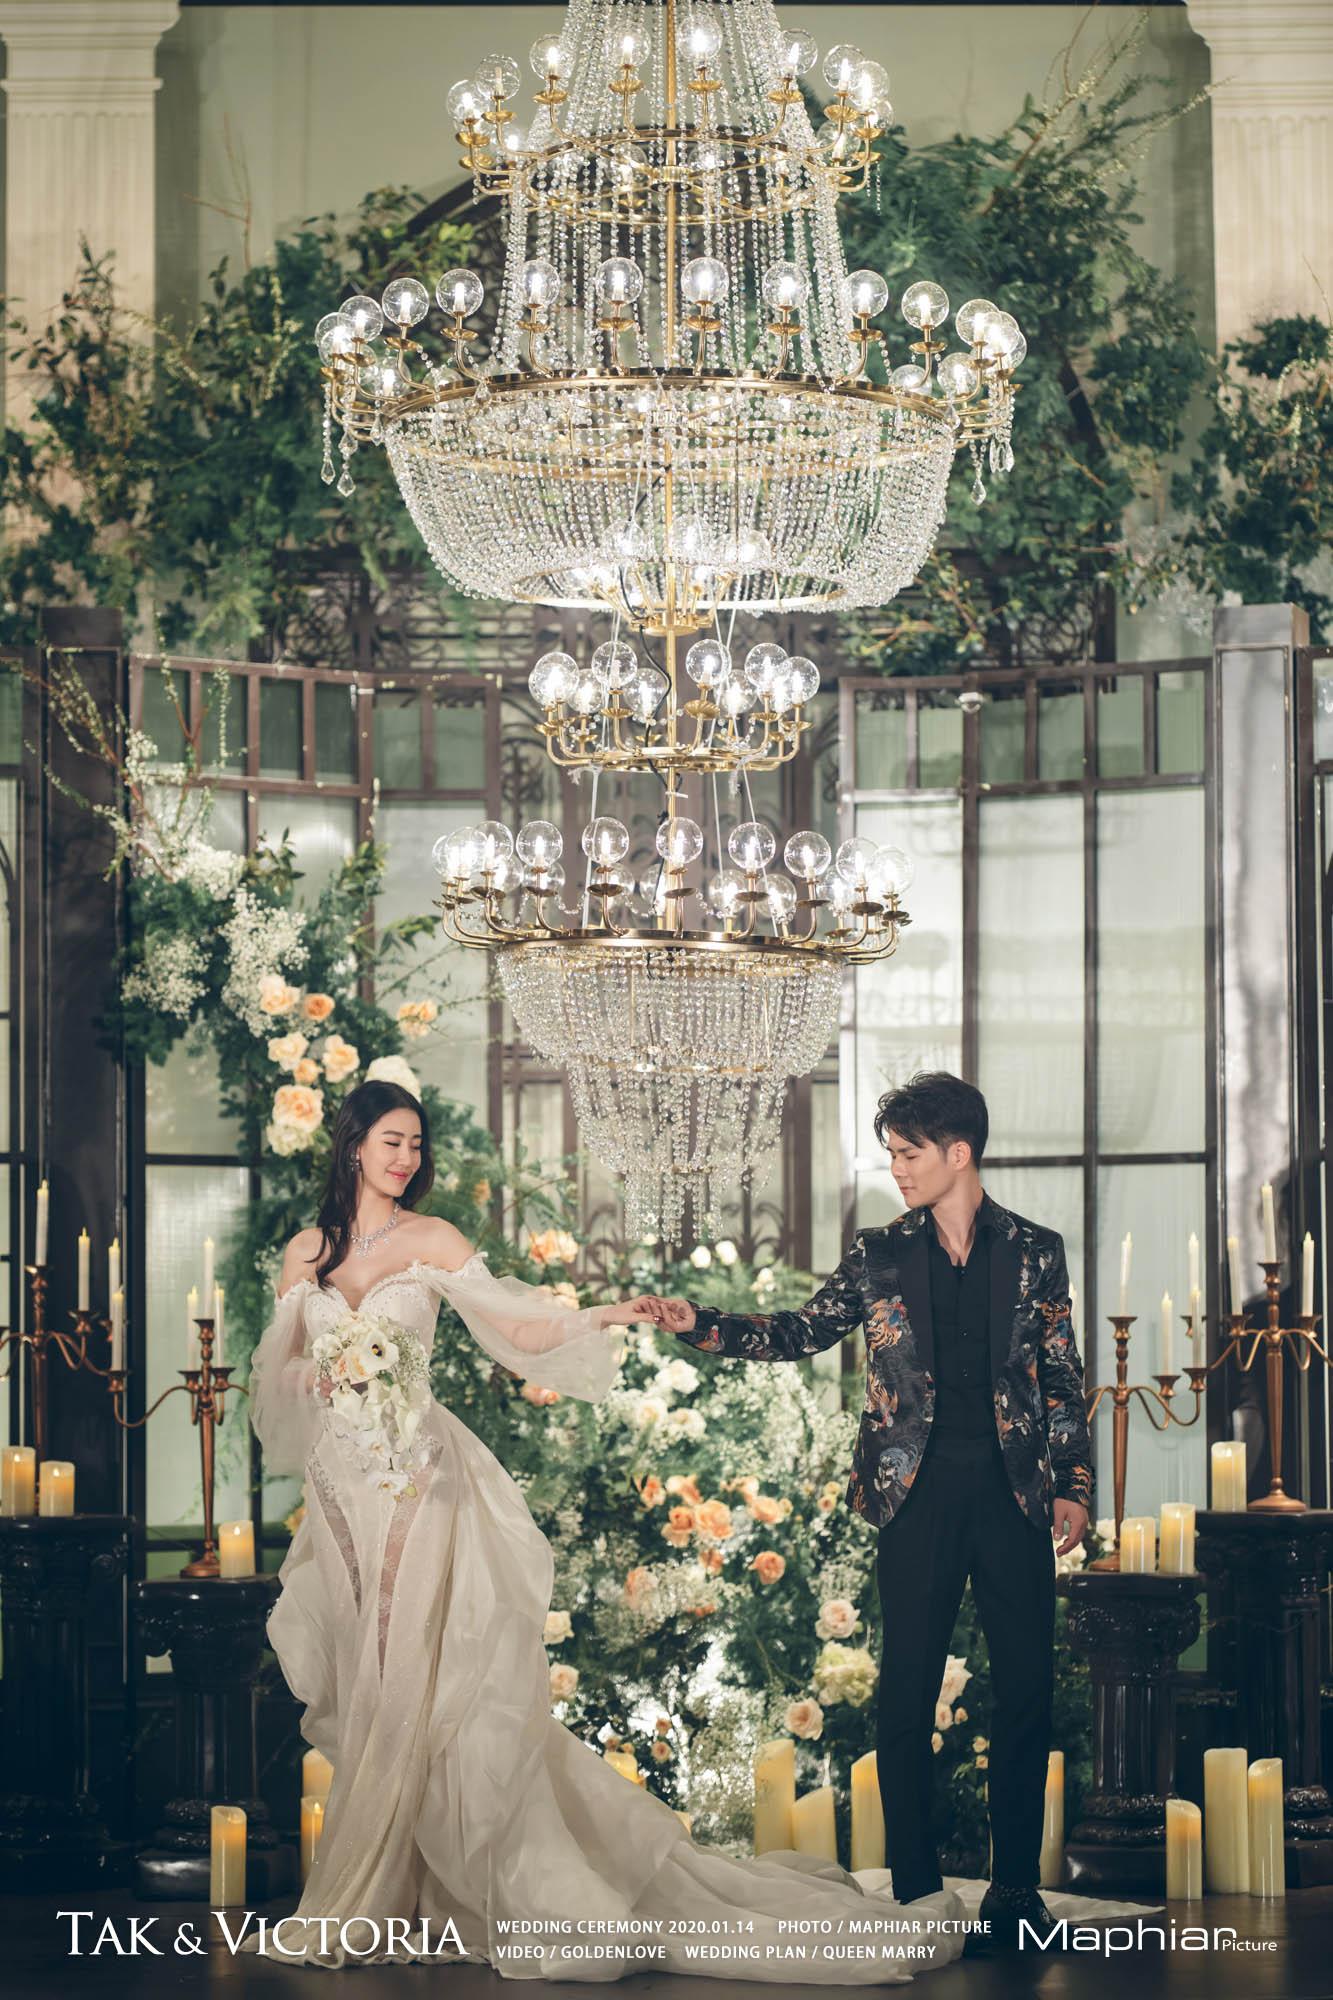 TAK & VICTORIA · 广州婚礼